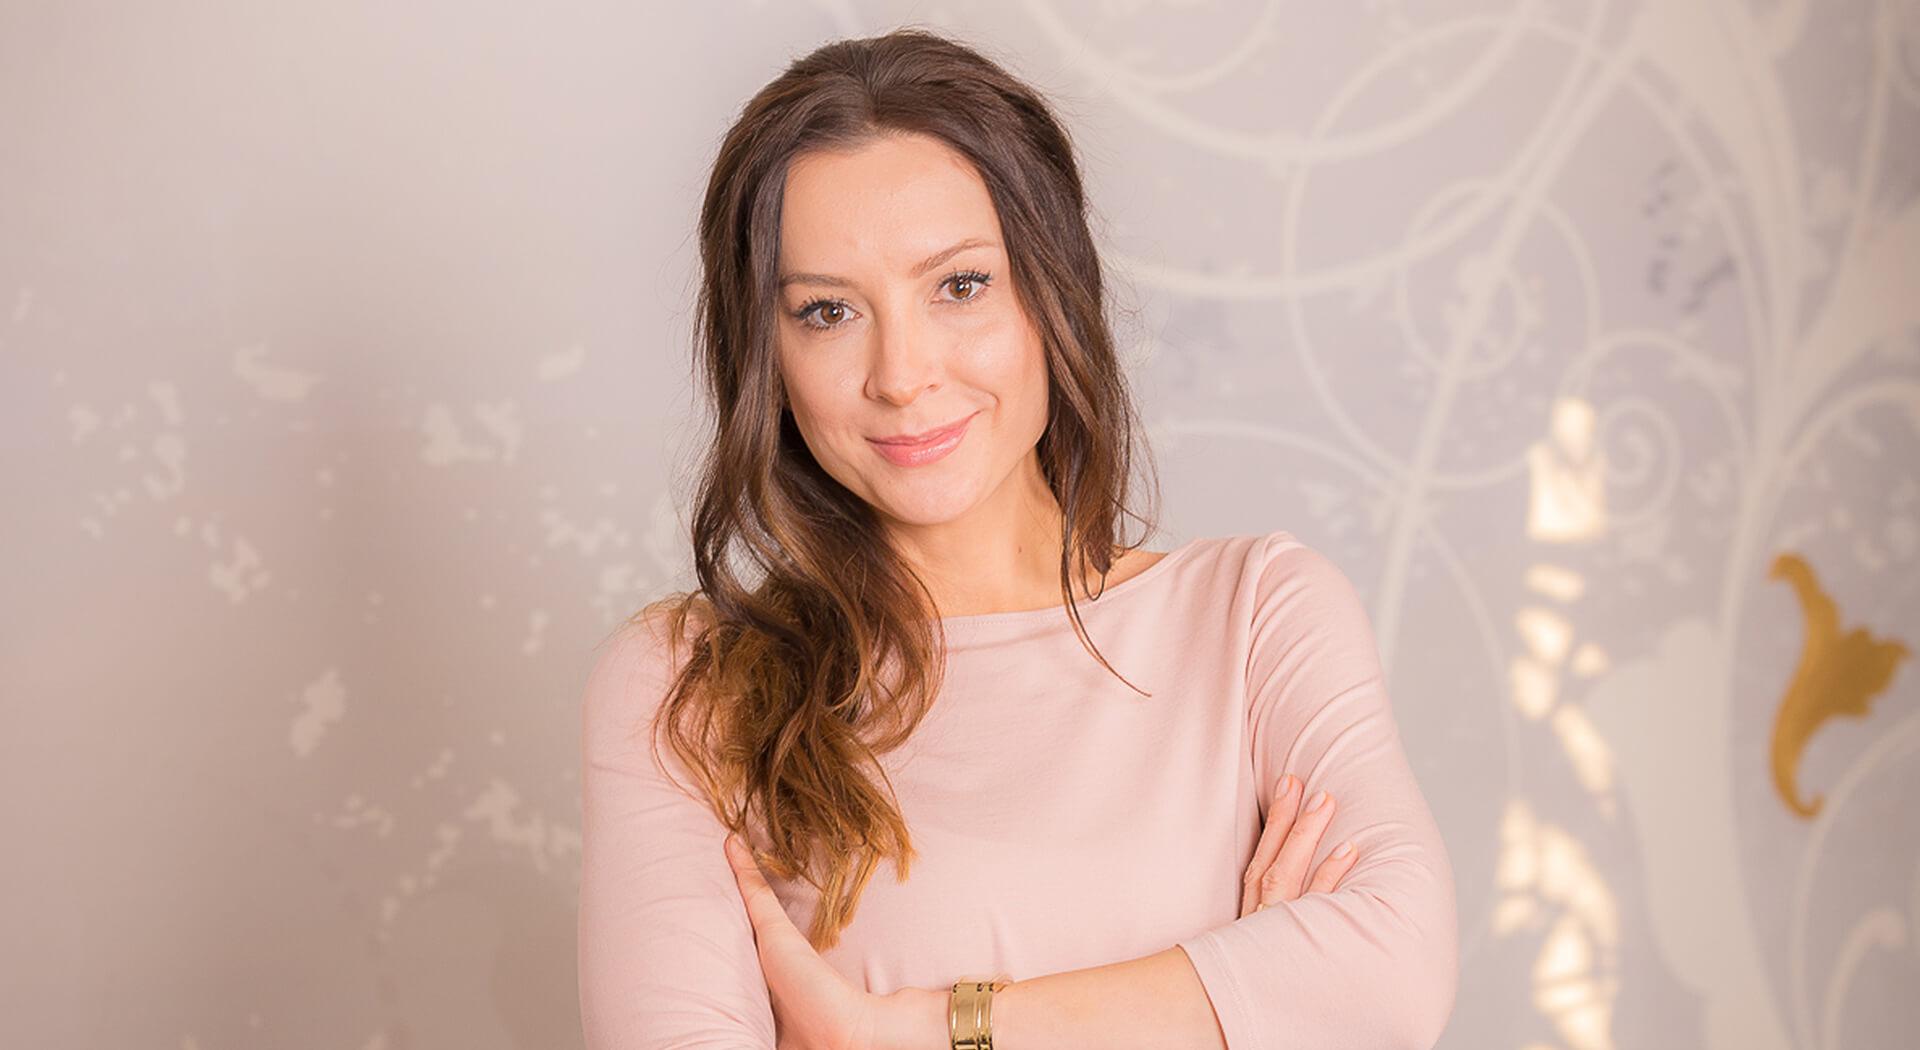 MomPreneurs Patricia Stenert Frau der Lage